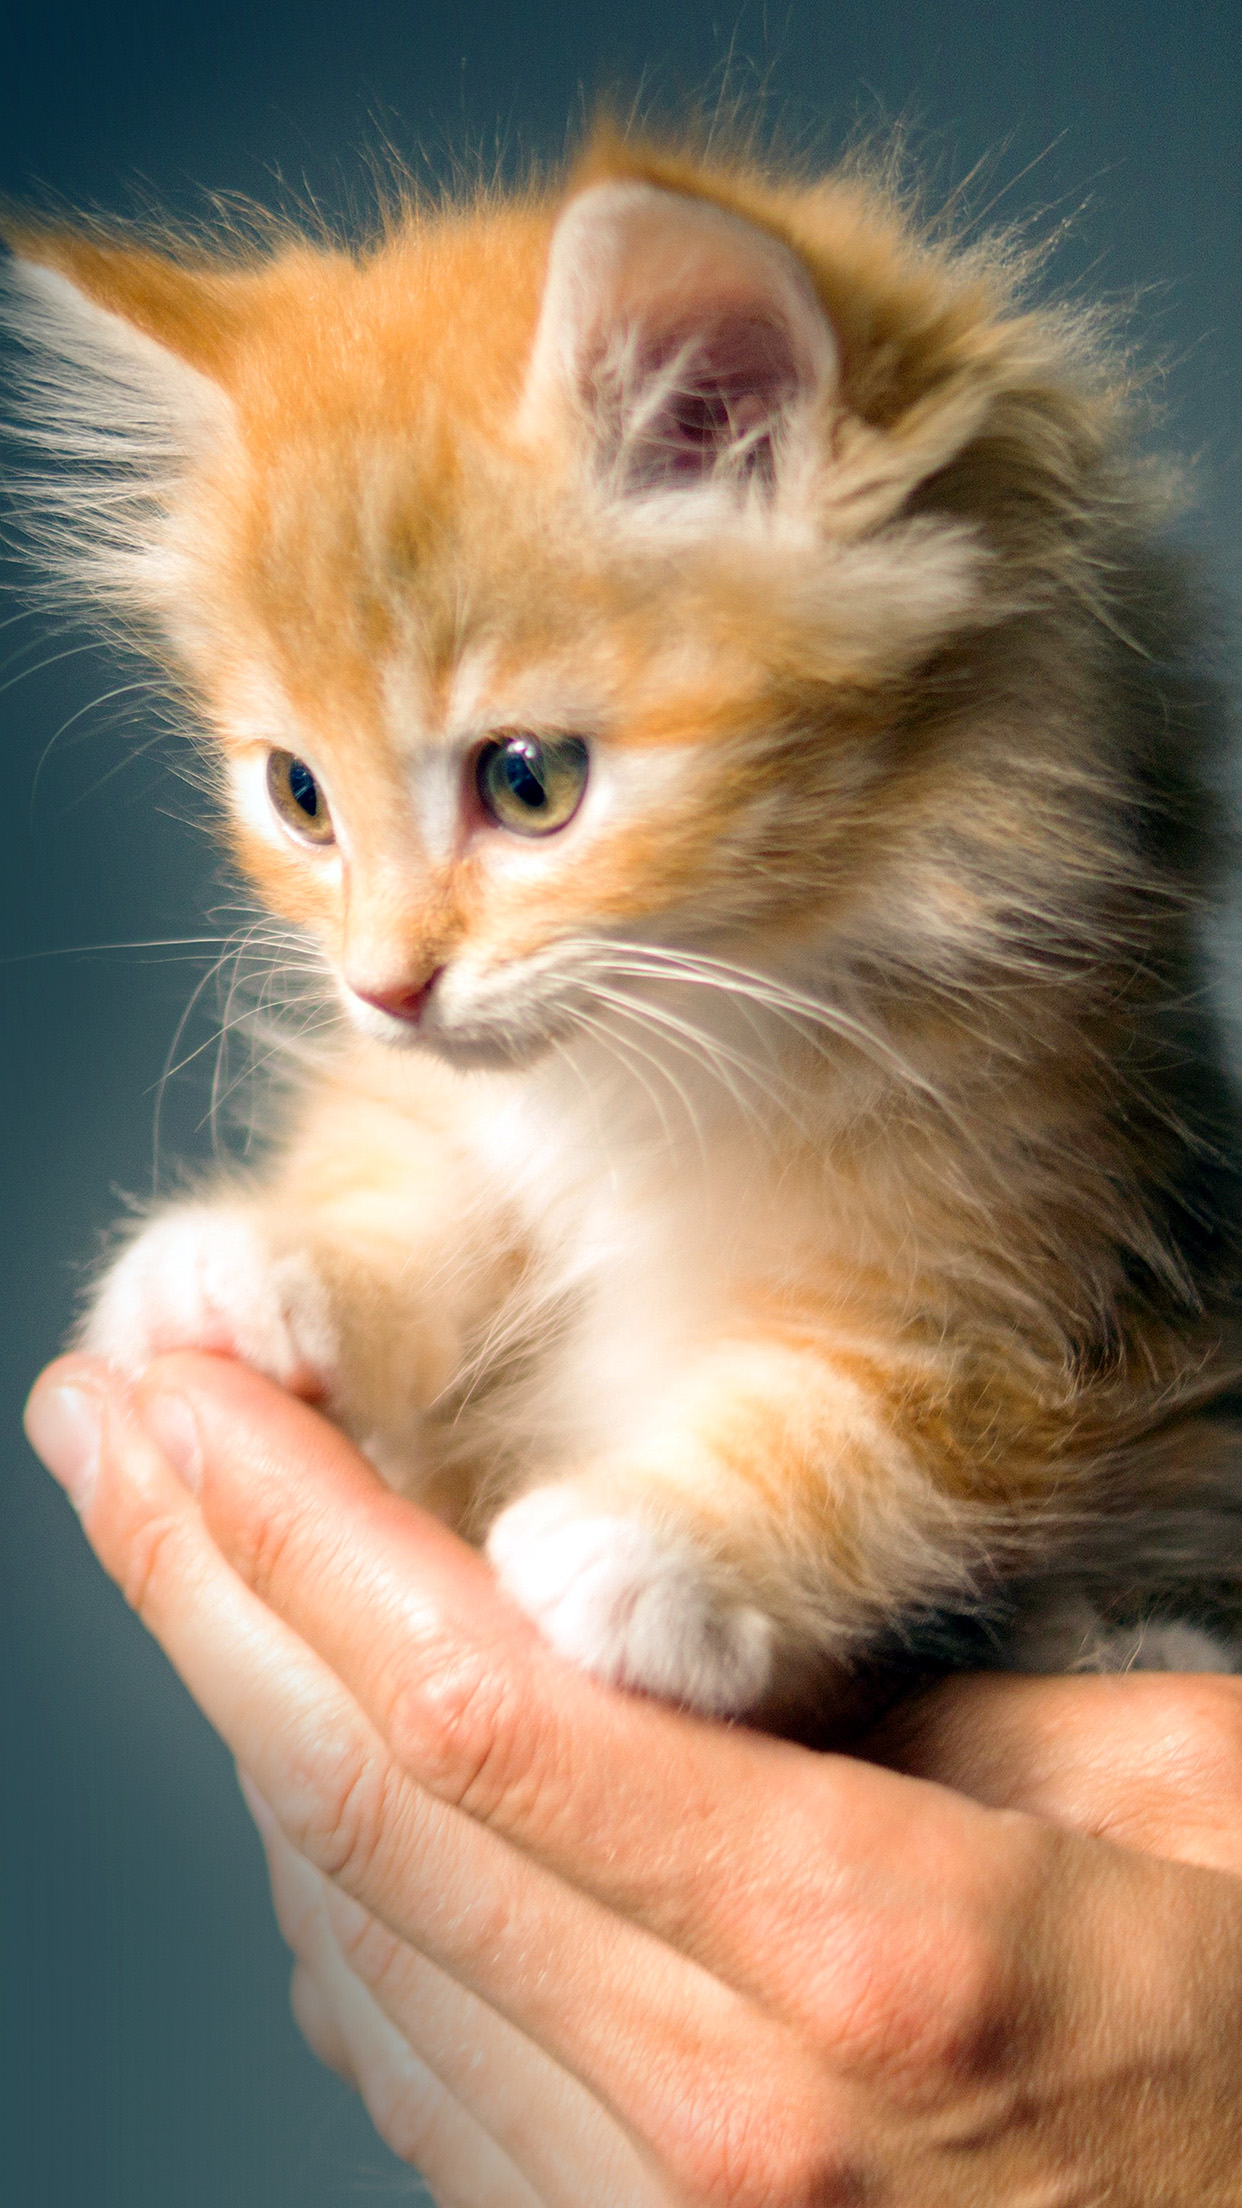 Iphonexpapers Com Iphone X Wallpaper No47 Animal Cute Kitten Cat Nature